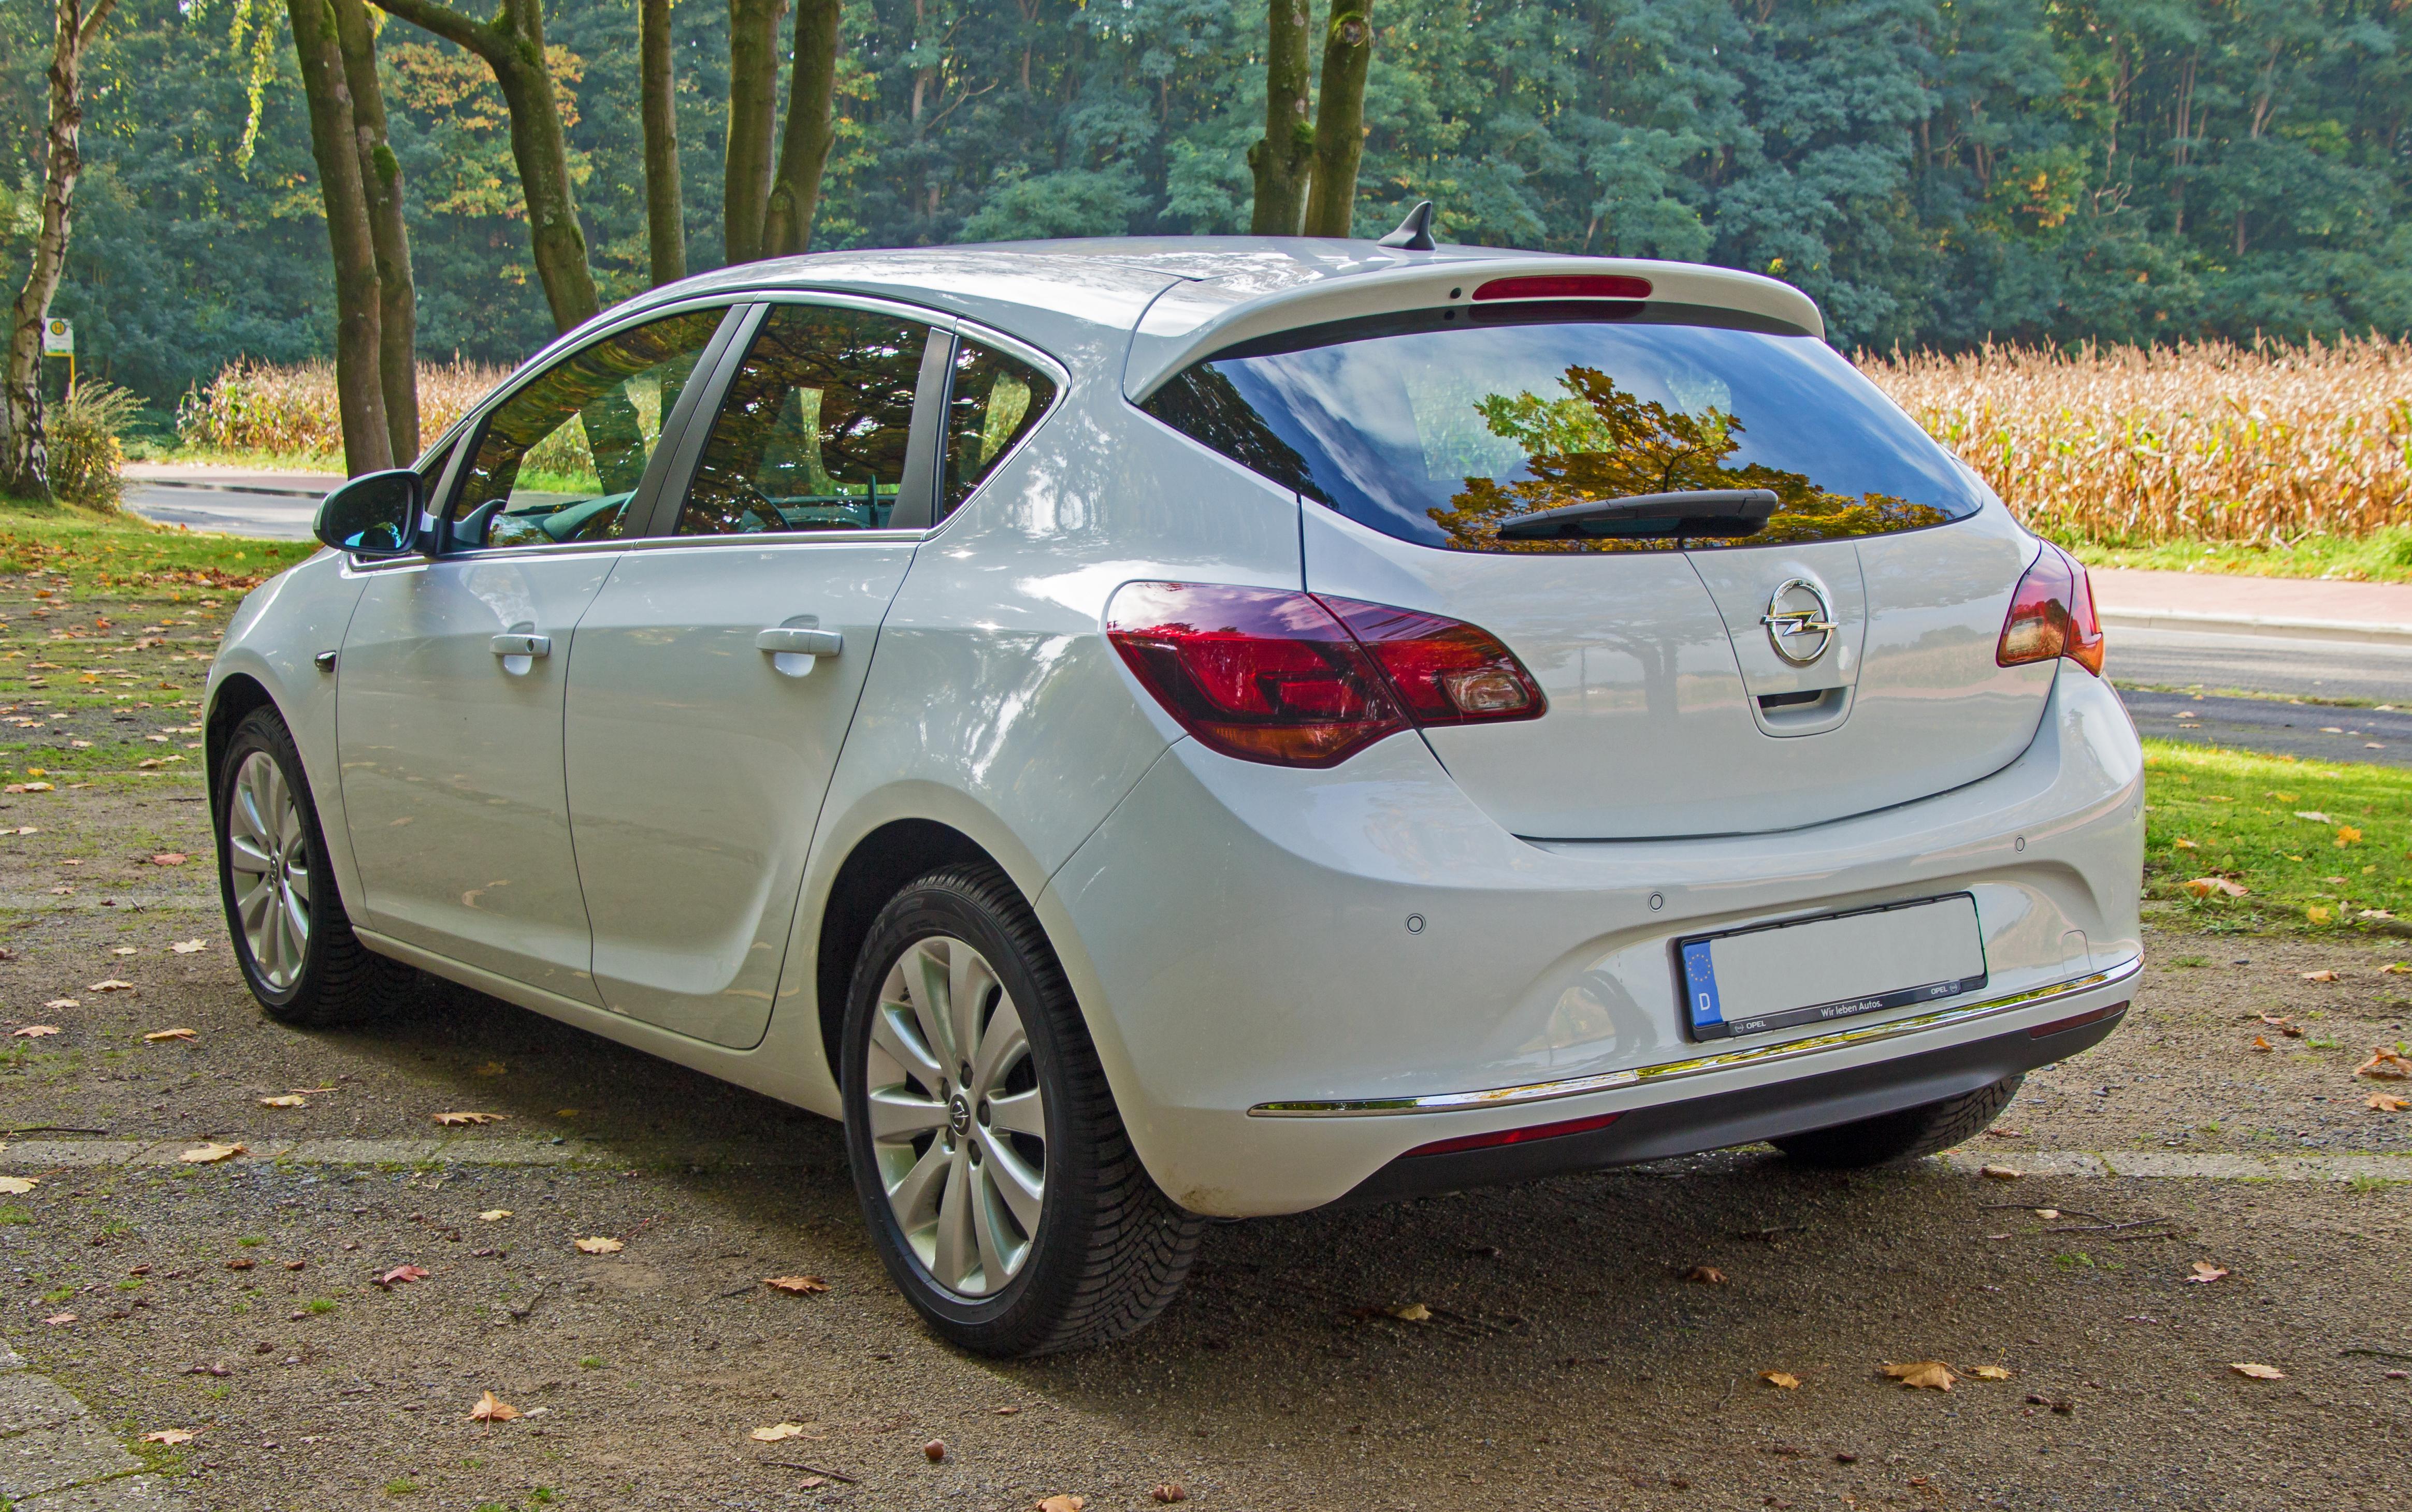 File Opel Astra J Modellpflege Heck Jpg Wikimedia Commons